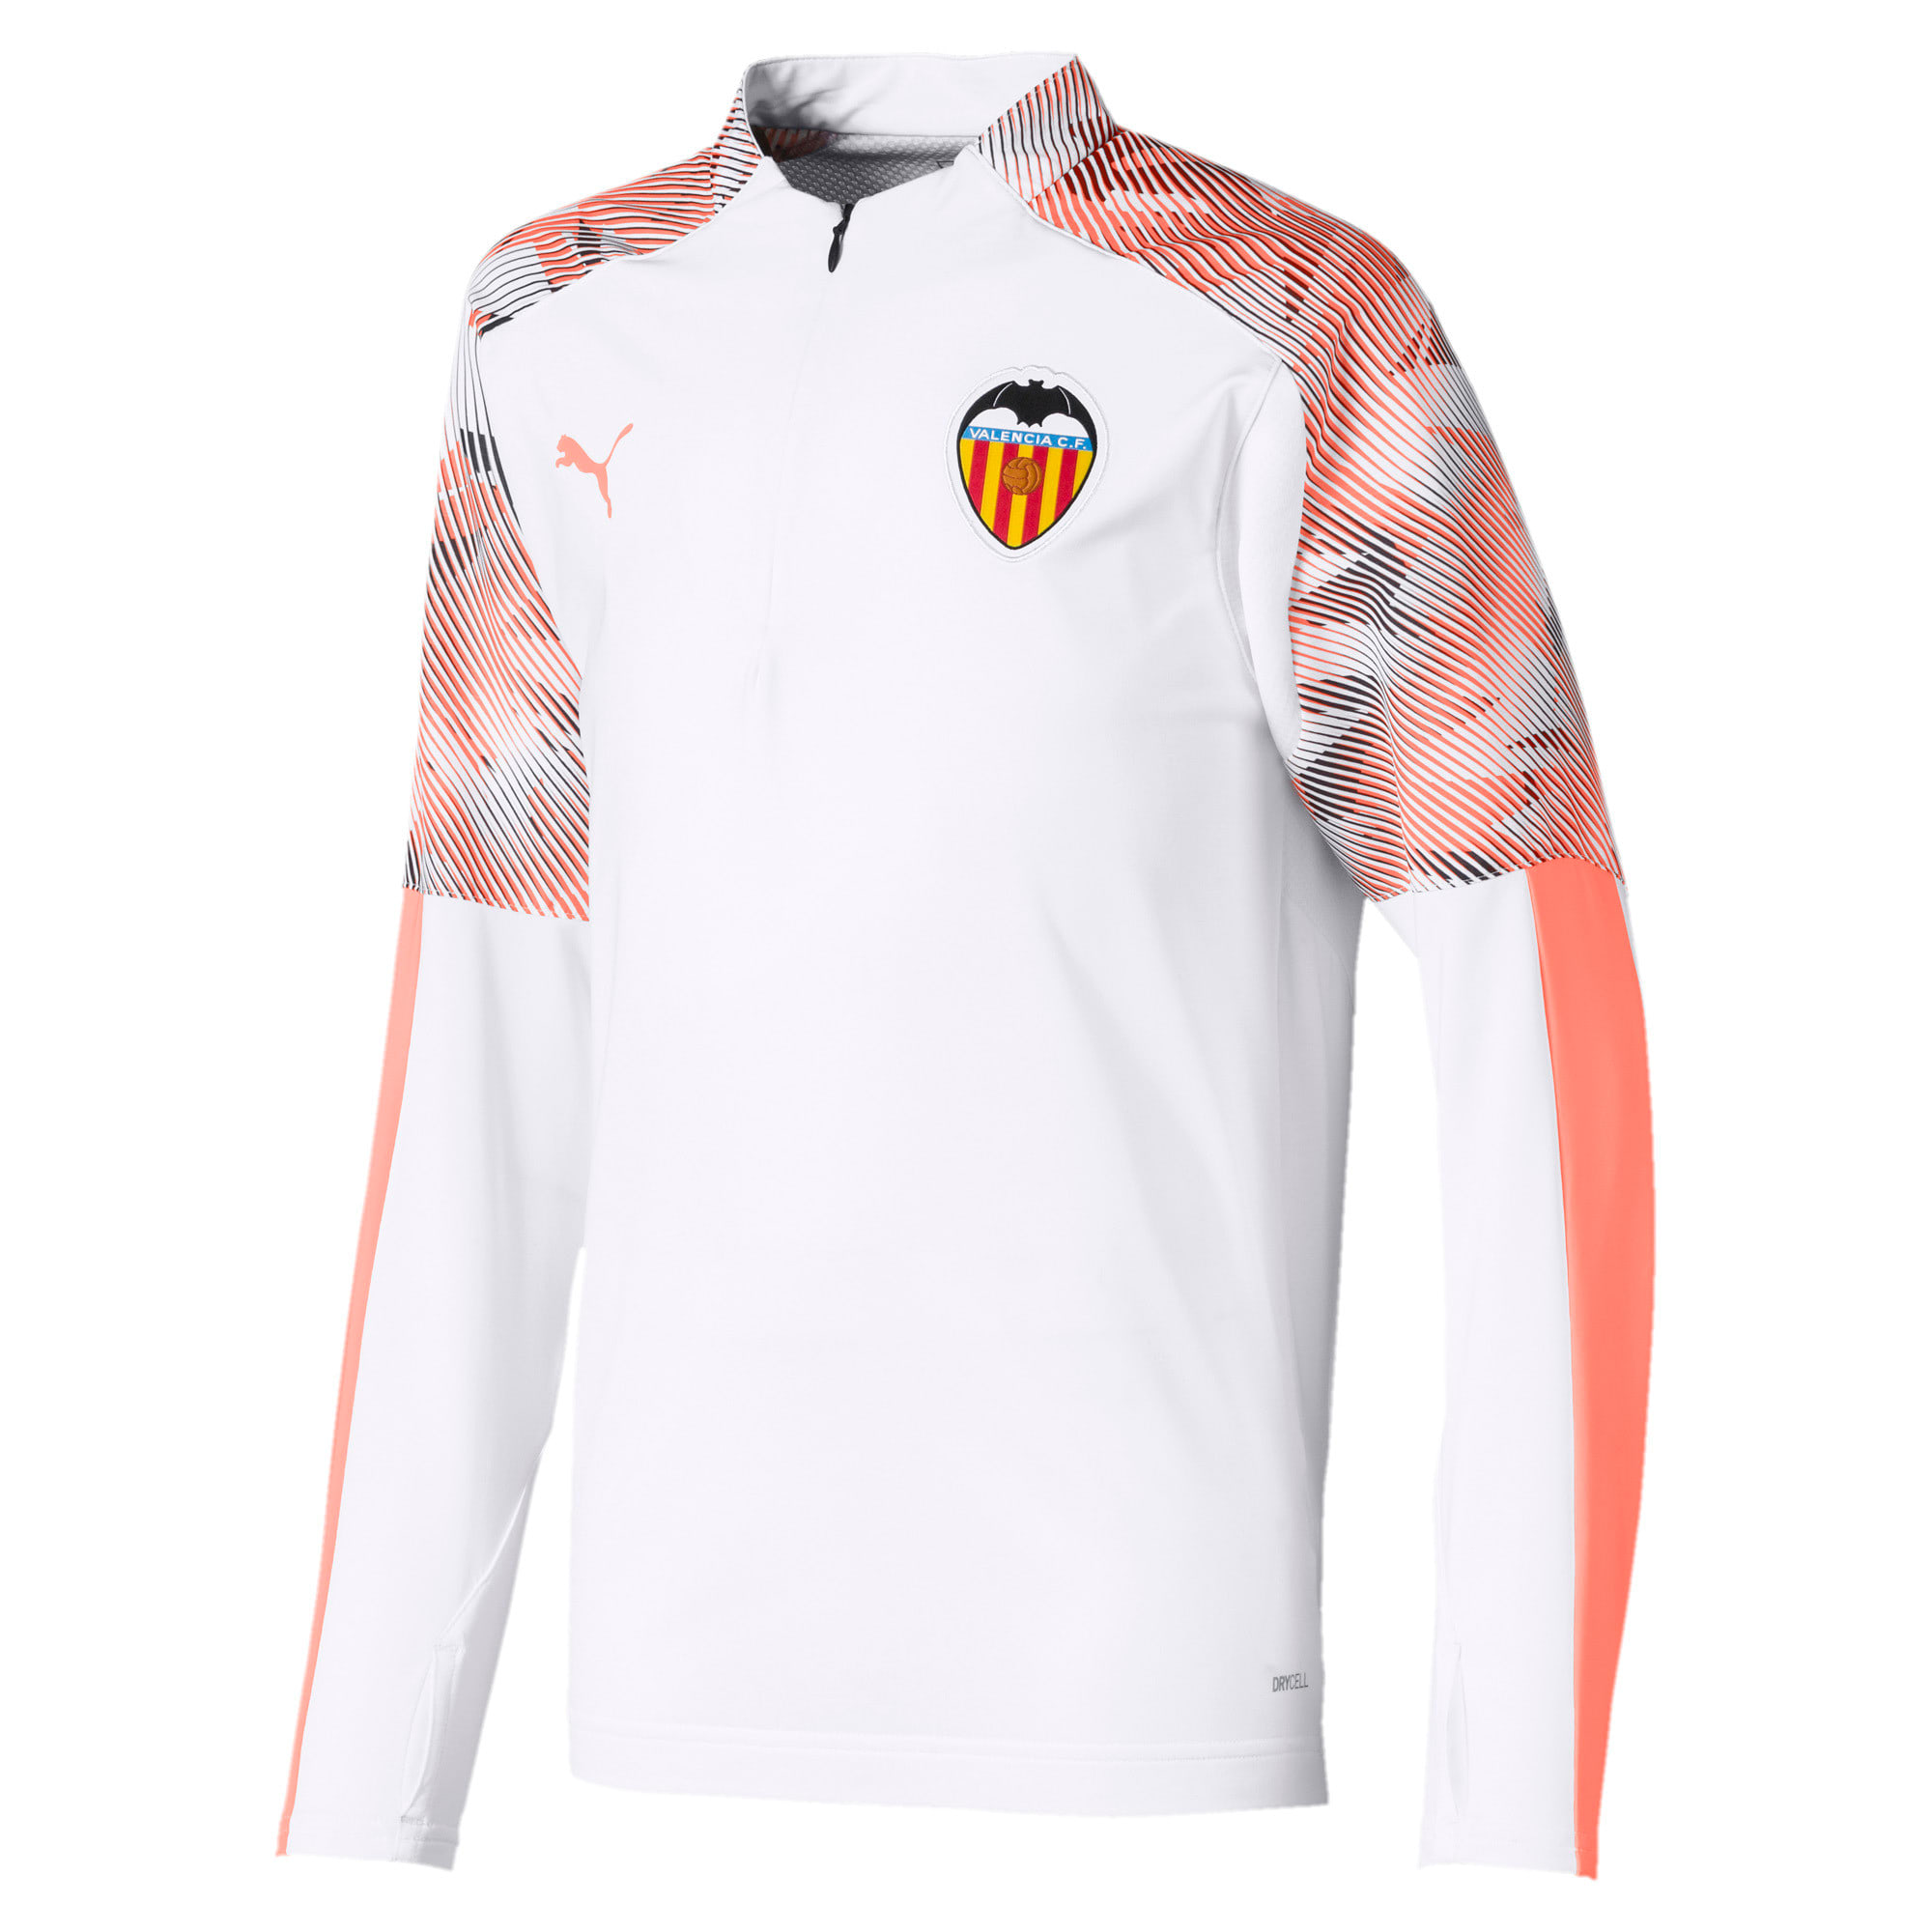 Thumbnail 1 of Valencia CF Quarter Zip Kids' Training Top, Puma White-Fizzy Orange, medium